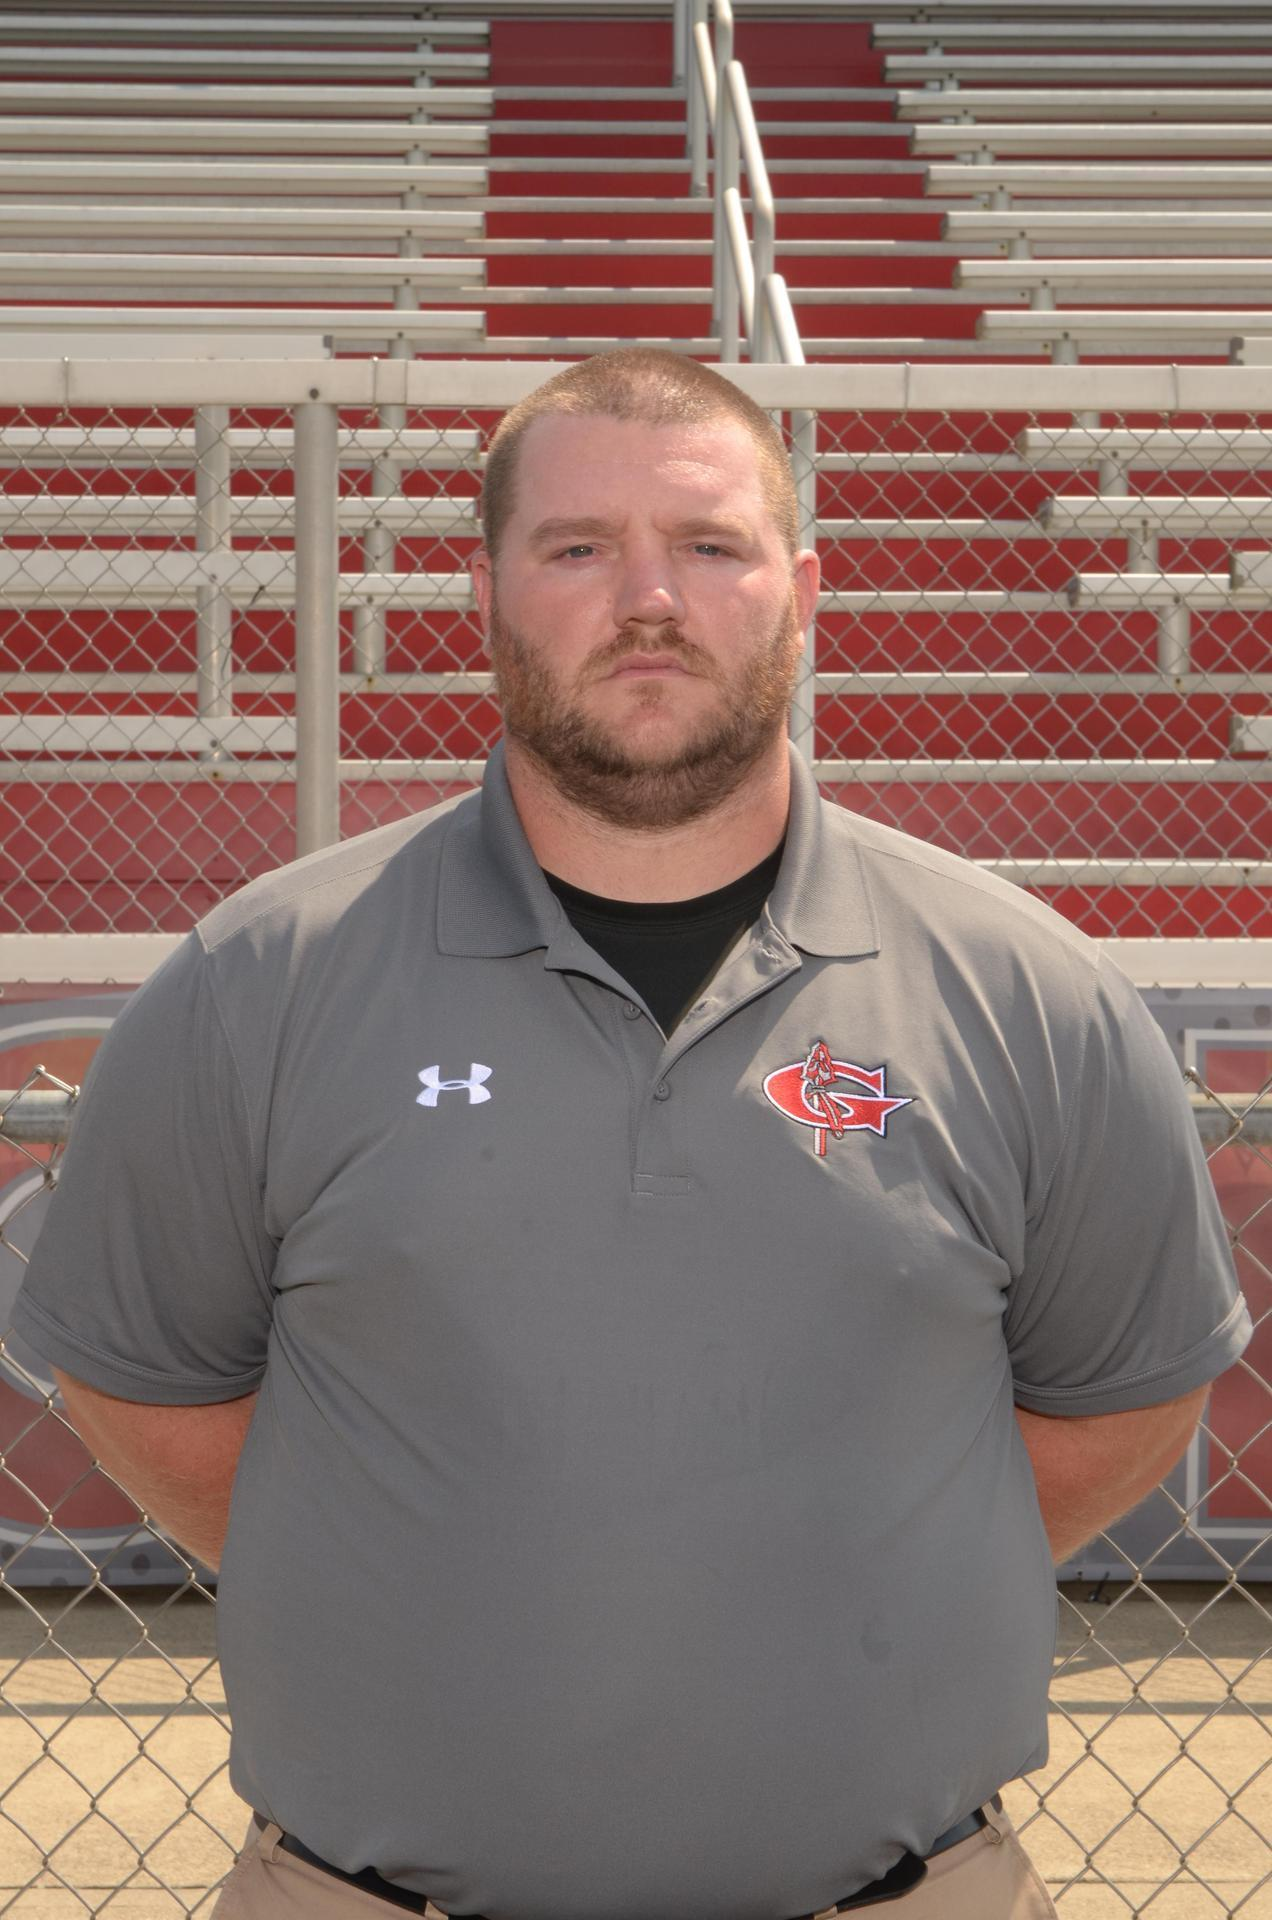 Head Coach Miller